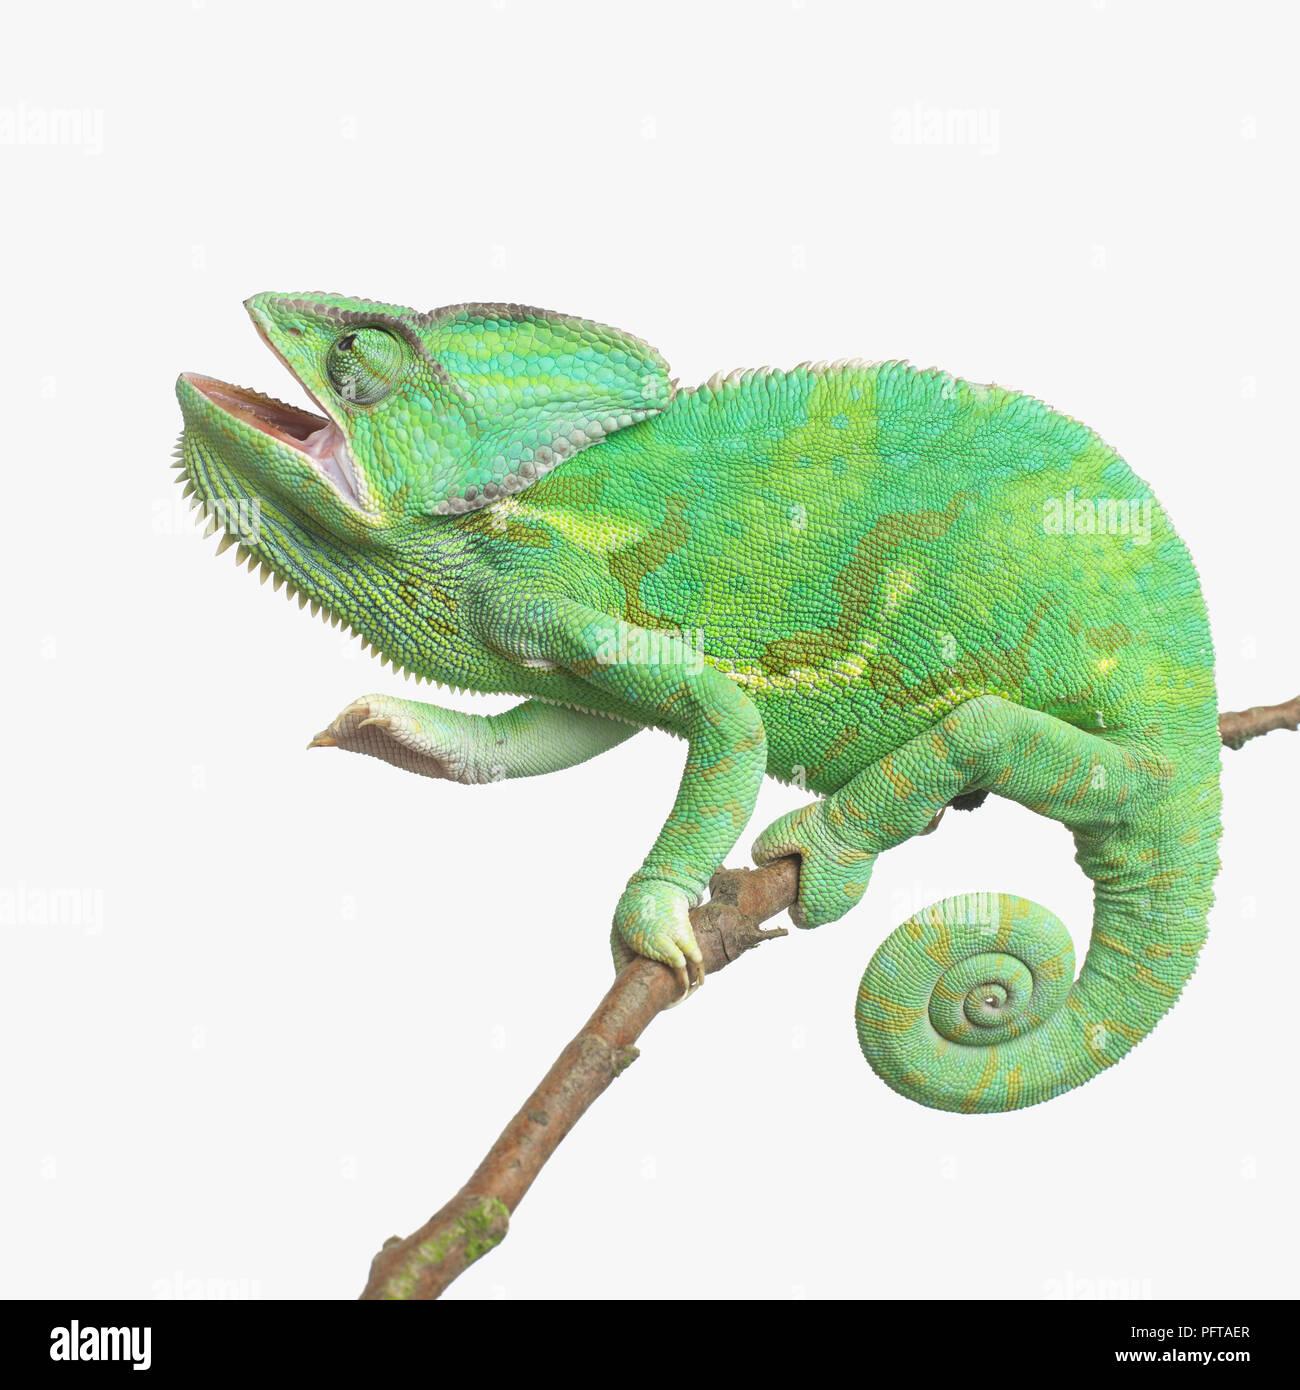 Yemen Chameleon, Veiled Chameleon (Chamaeleo calyptratus) - Stock Image